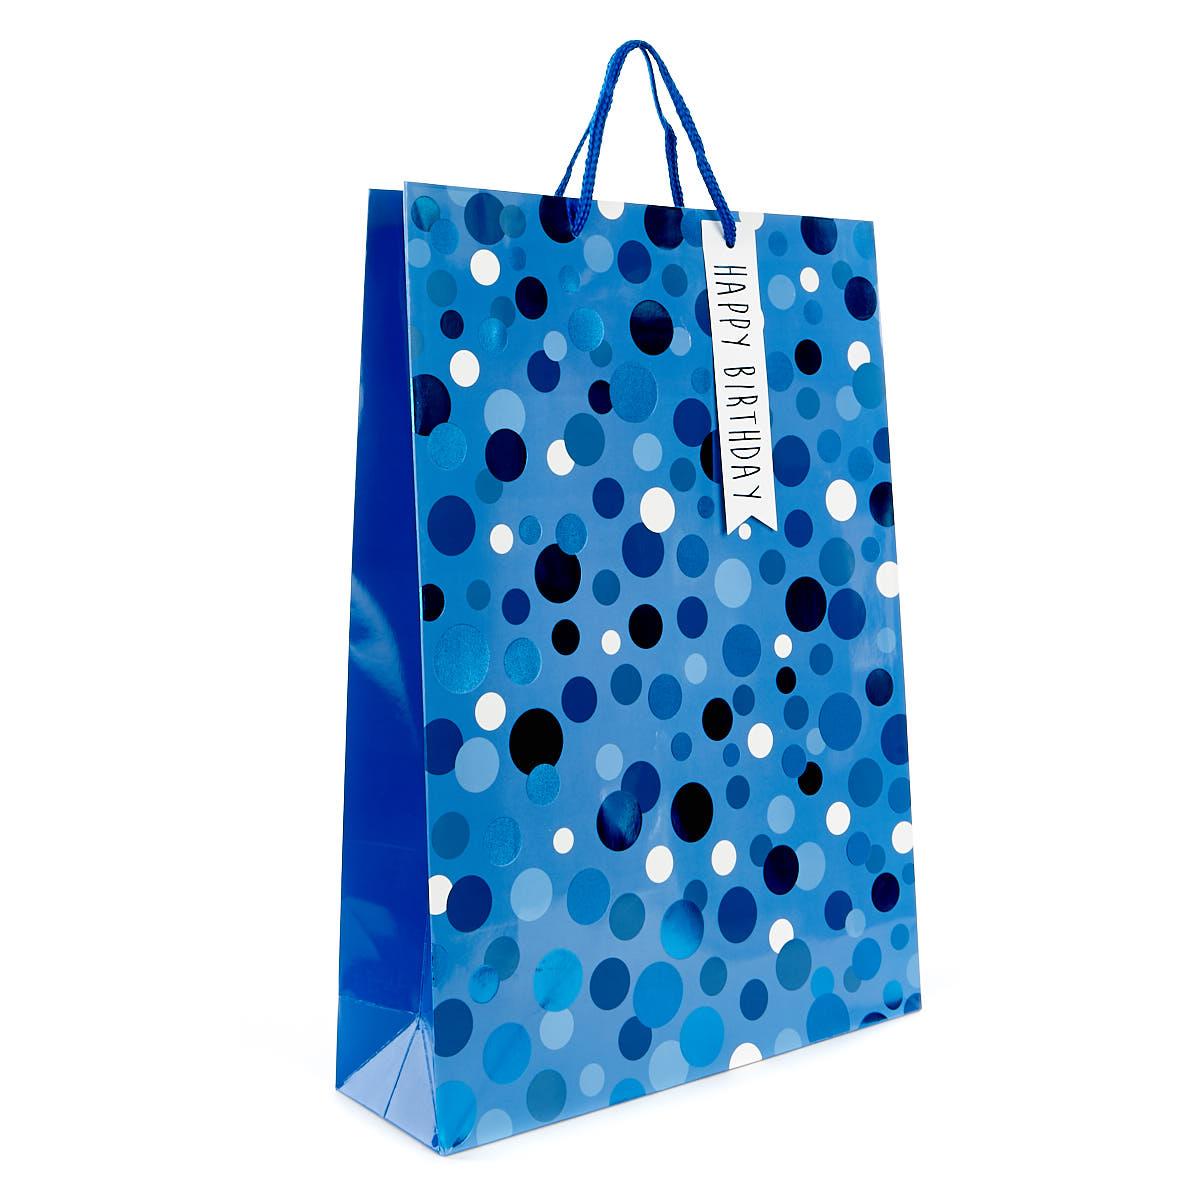 Large Blue Polka Dot Birthday Gift Bag